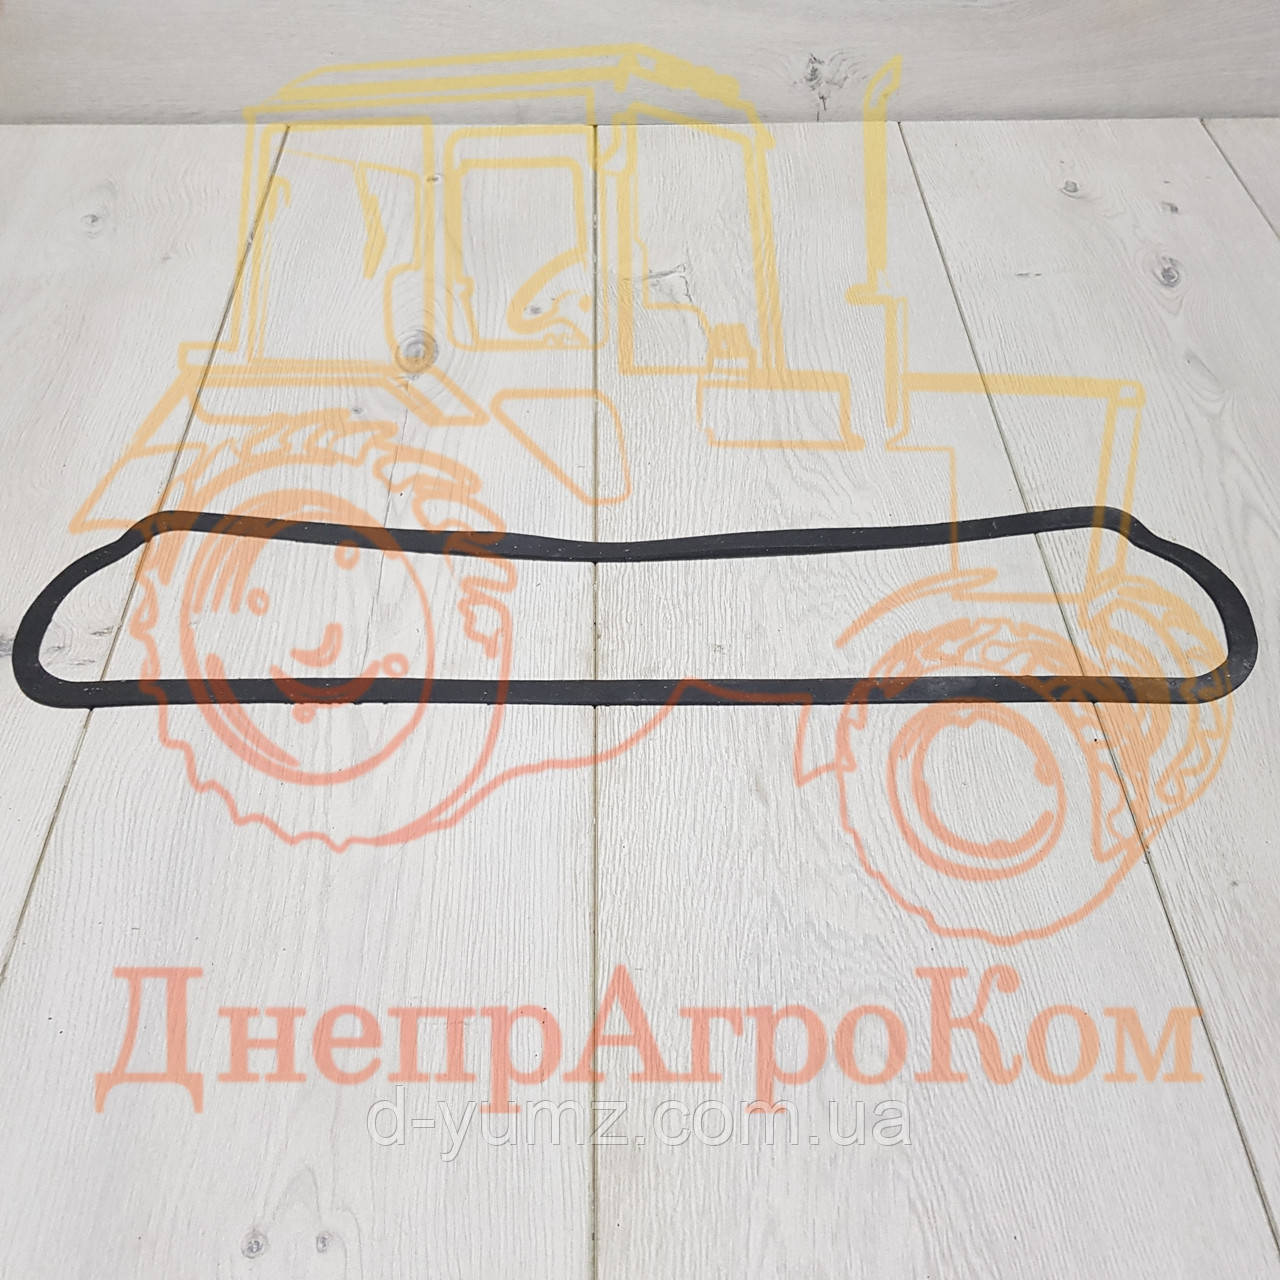 Прокладка крышки клапанов ЮМЗ Д65-02-030